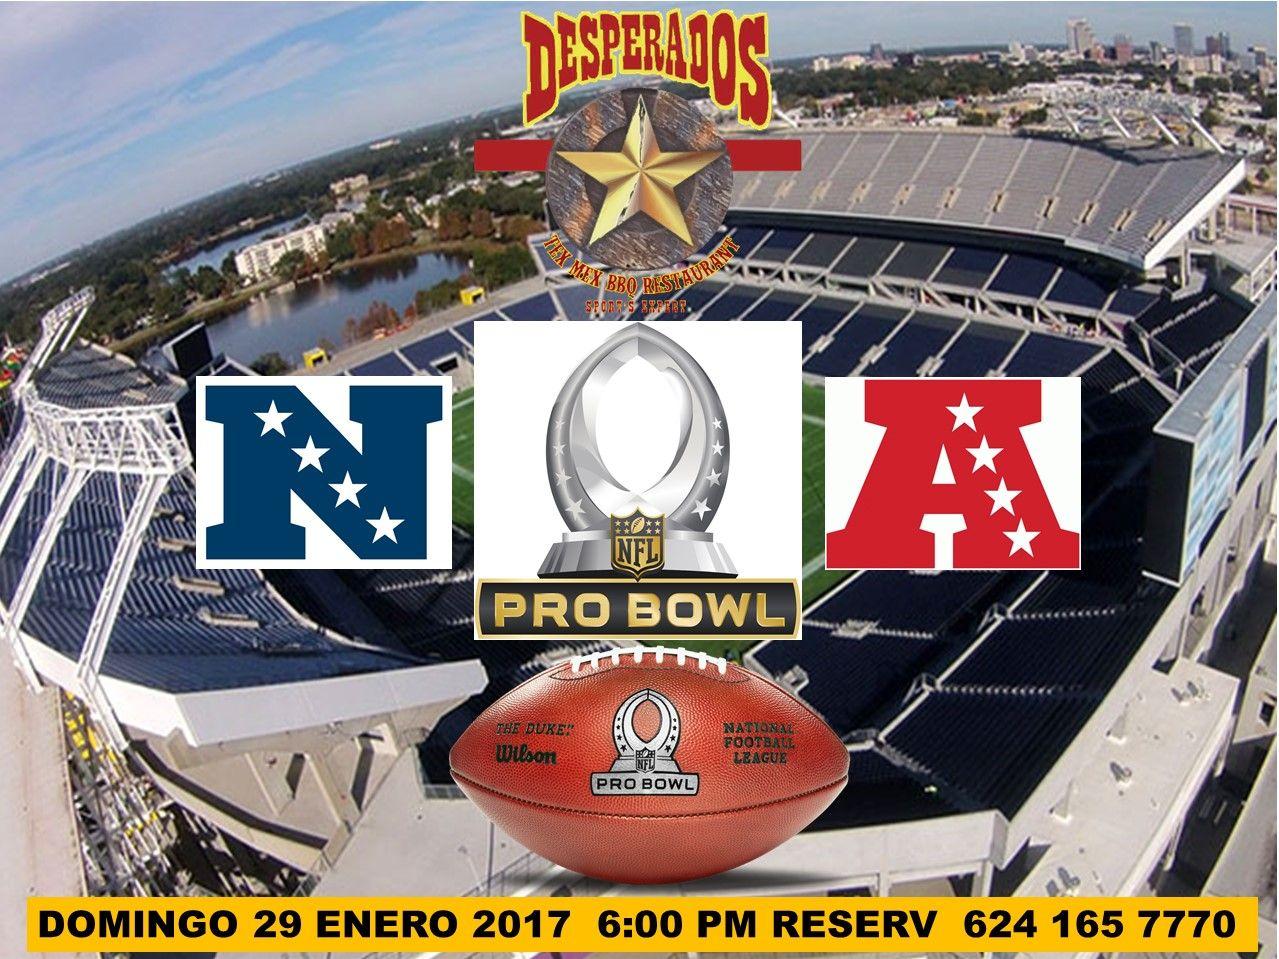 Pro bowl Jan 29, 2017 Nfl, Bowl